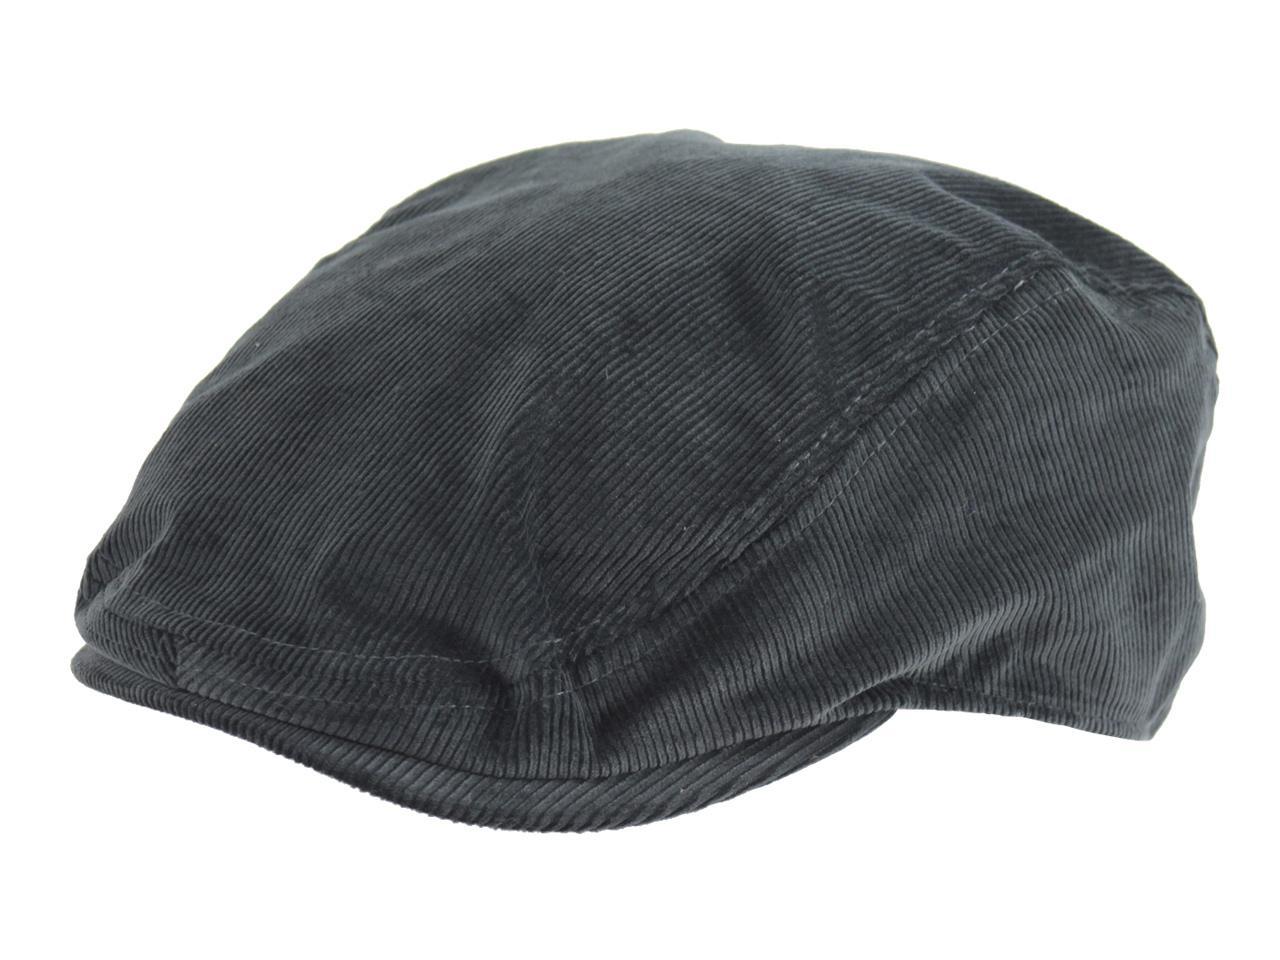 c2611a1edb682d Kangol Men's Cord Ivy Flat Cap Hat by Kangol